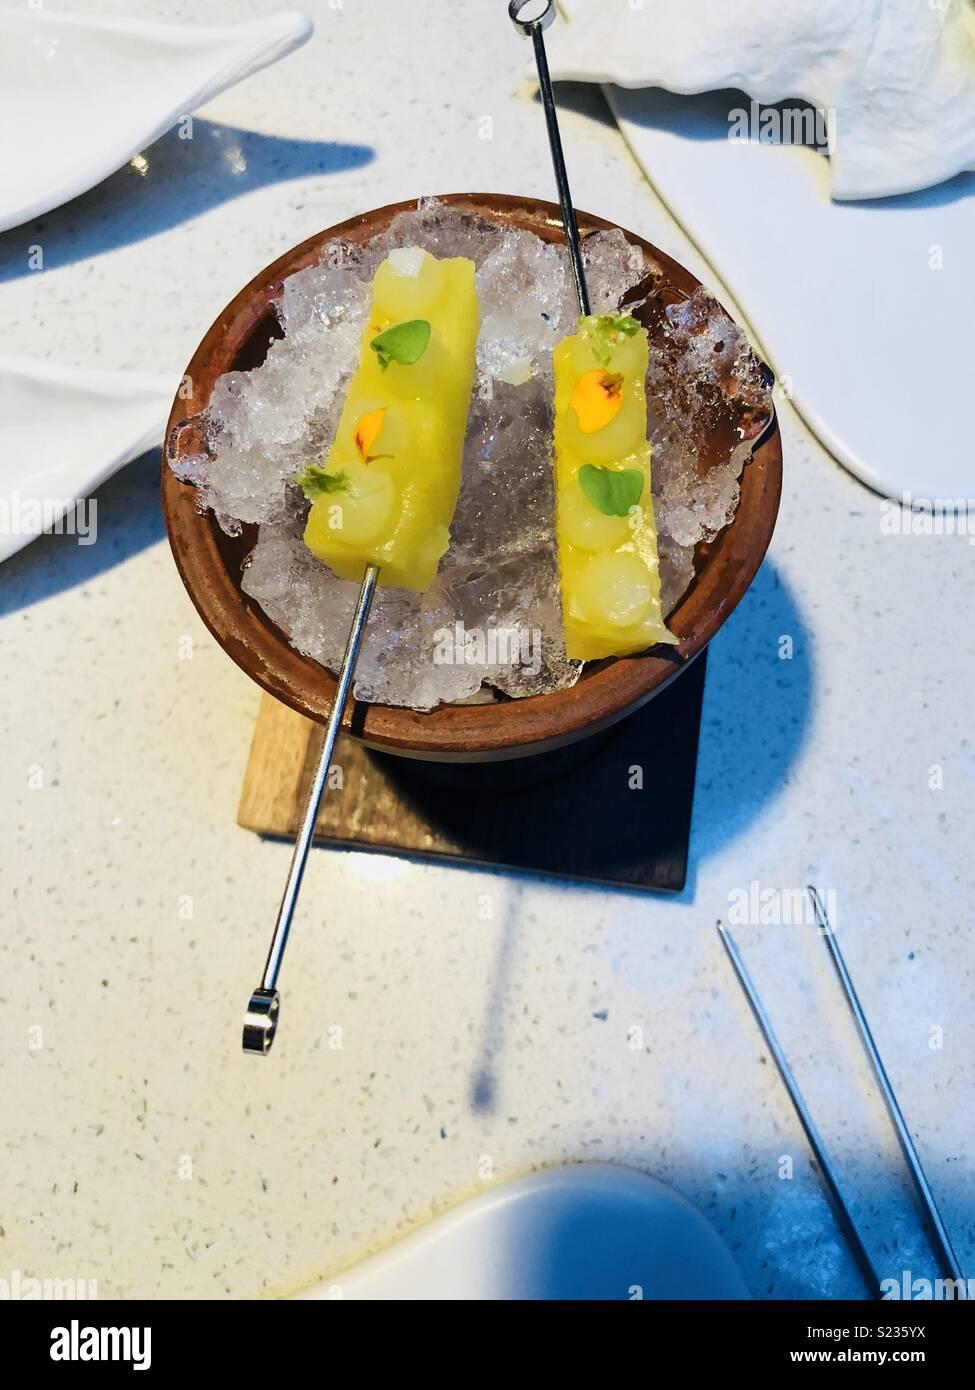 Pineapple kebabs on Ice - Stock Image